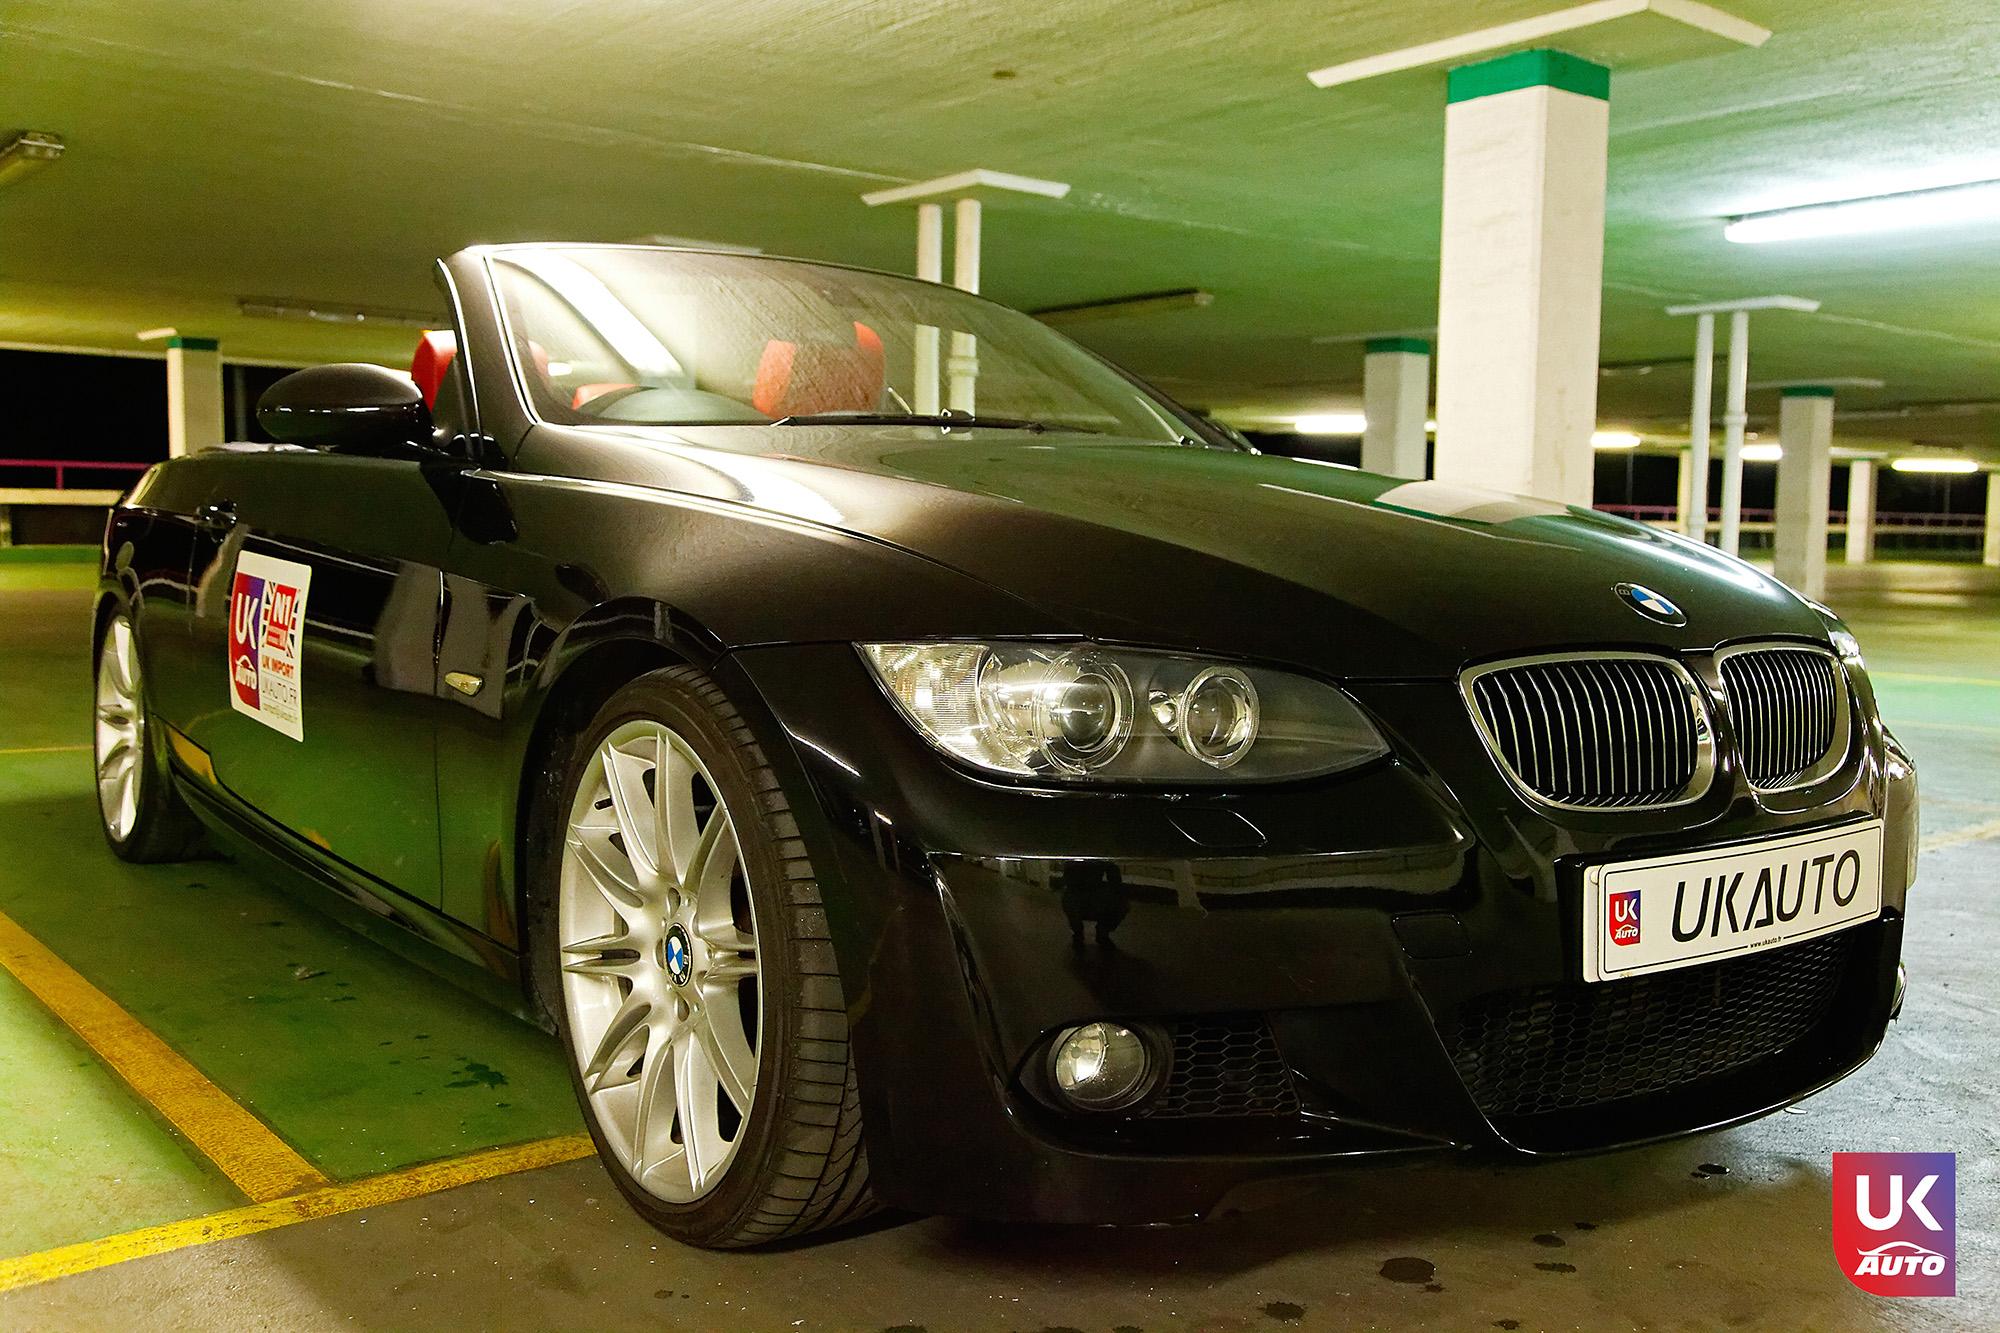 UKAUTO IMPORT ANGLETERRE BMW 335i CABRIOLET UKA RHD2 - Felecitation a Jeremie pour cette BMW 335i cabriolet RHD PACK M IMPORT AUTO ANGLAISE